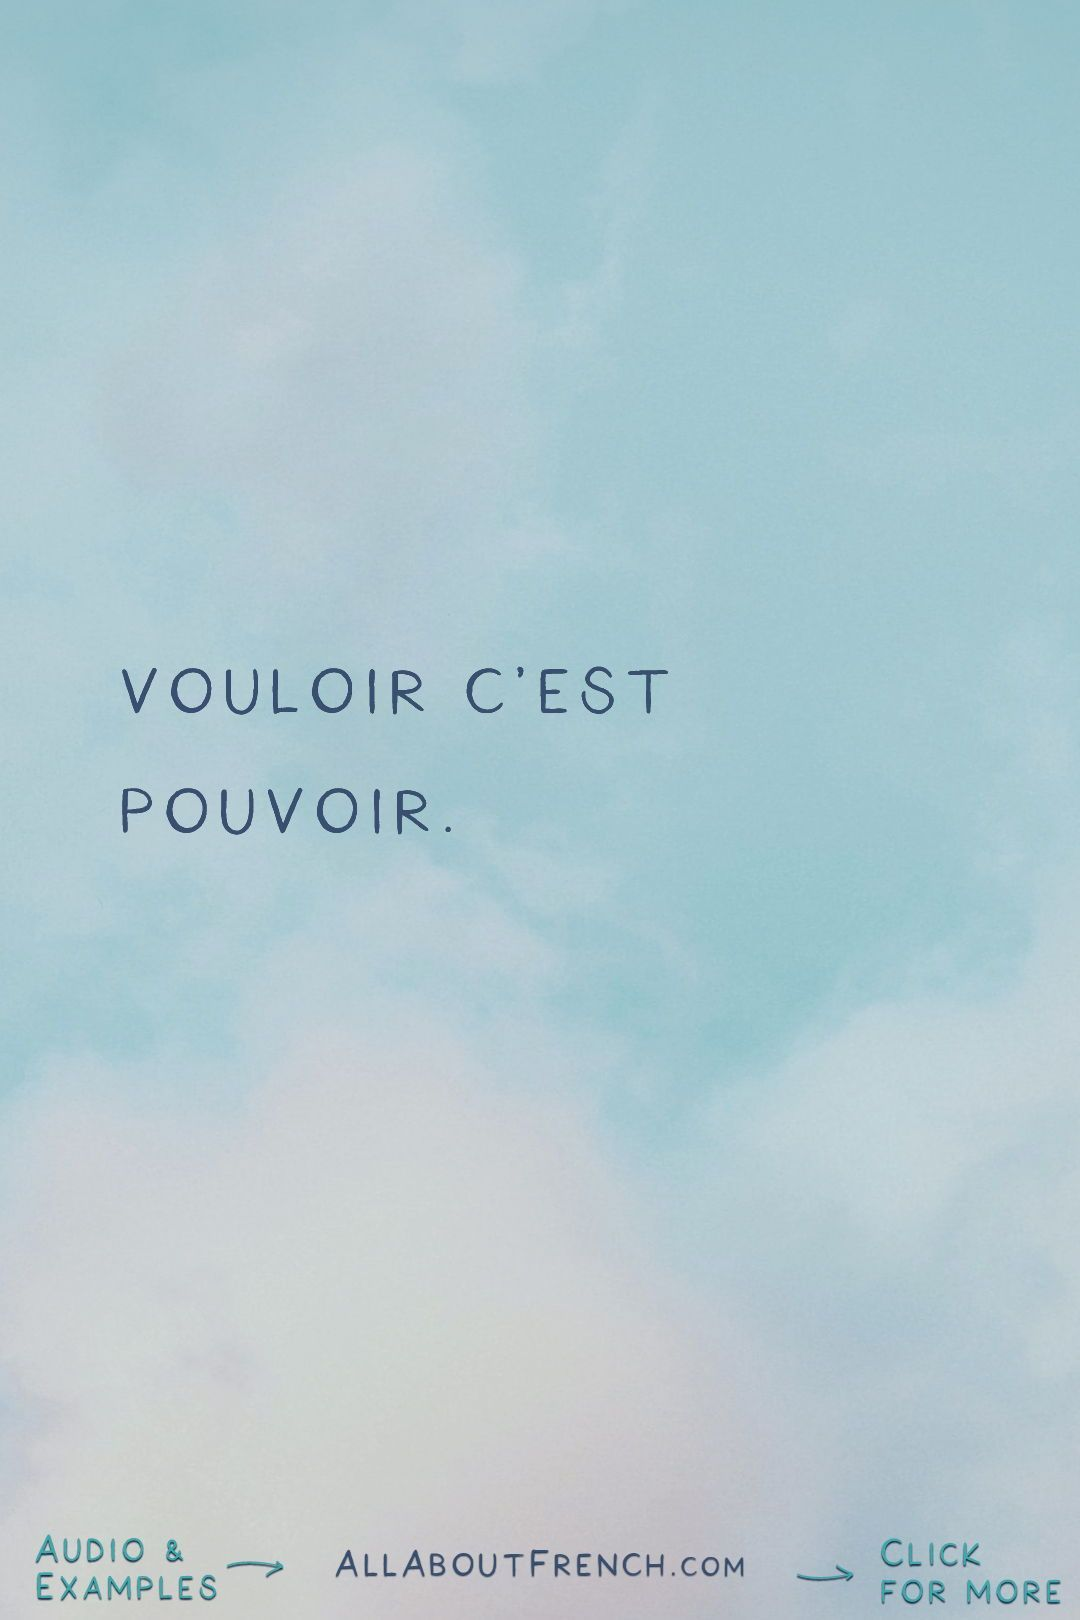 Learn French Sayings With Free Audio Examples En 2020 Mots Francais Apprendre Le Francais Citation